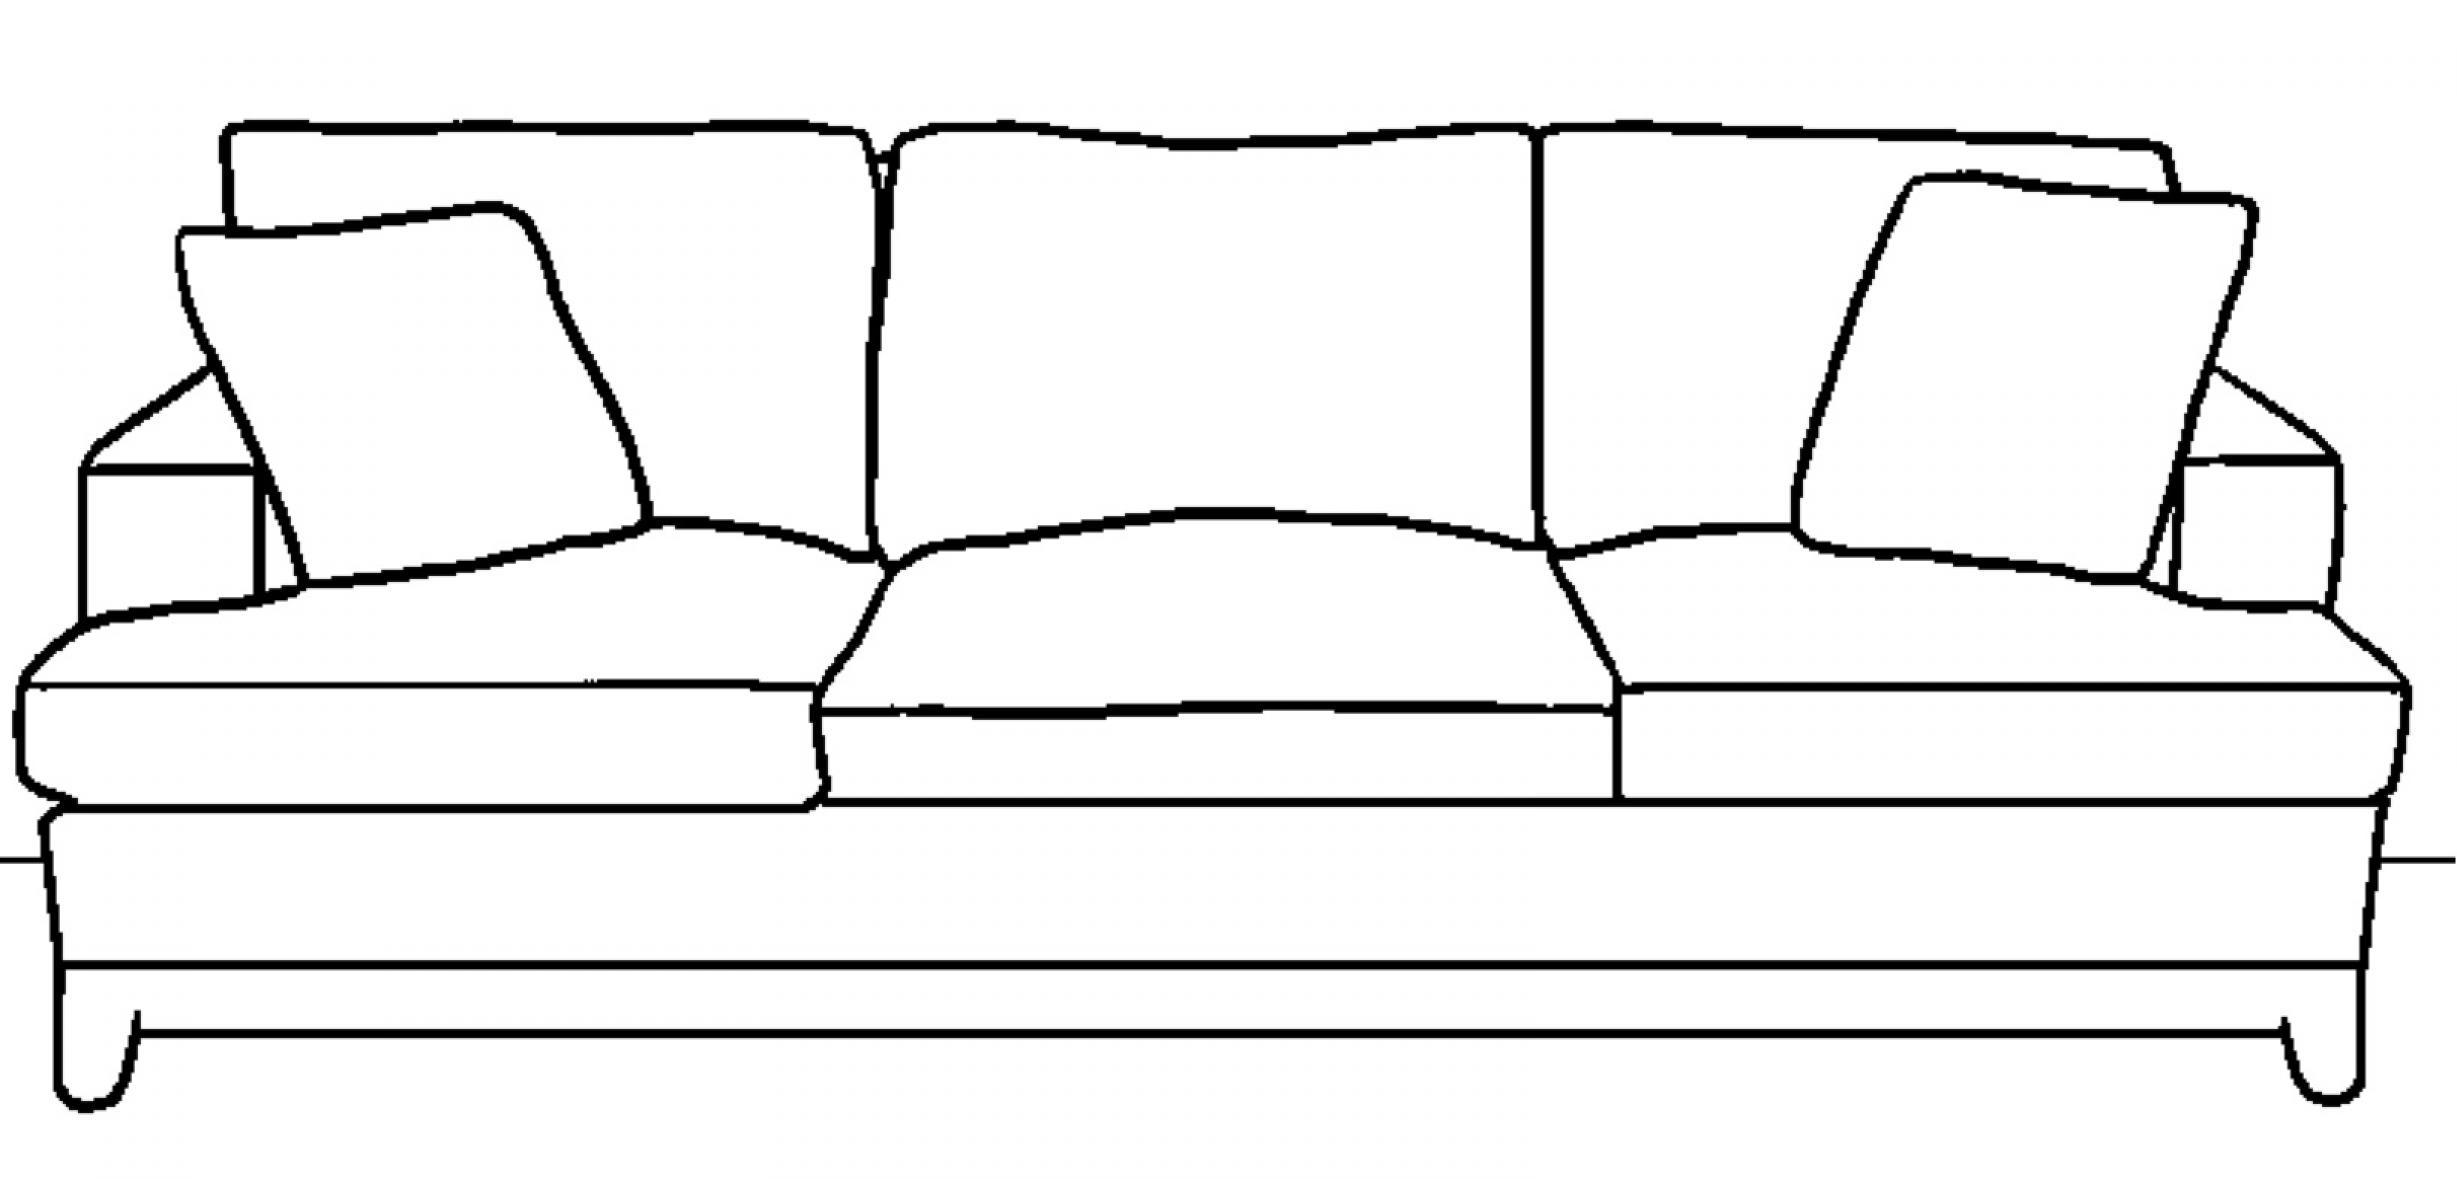 photos canap dessin couleur. Black Bedroom Furniture Sets. Home Design Ideas